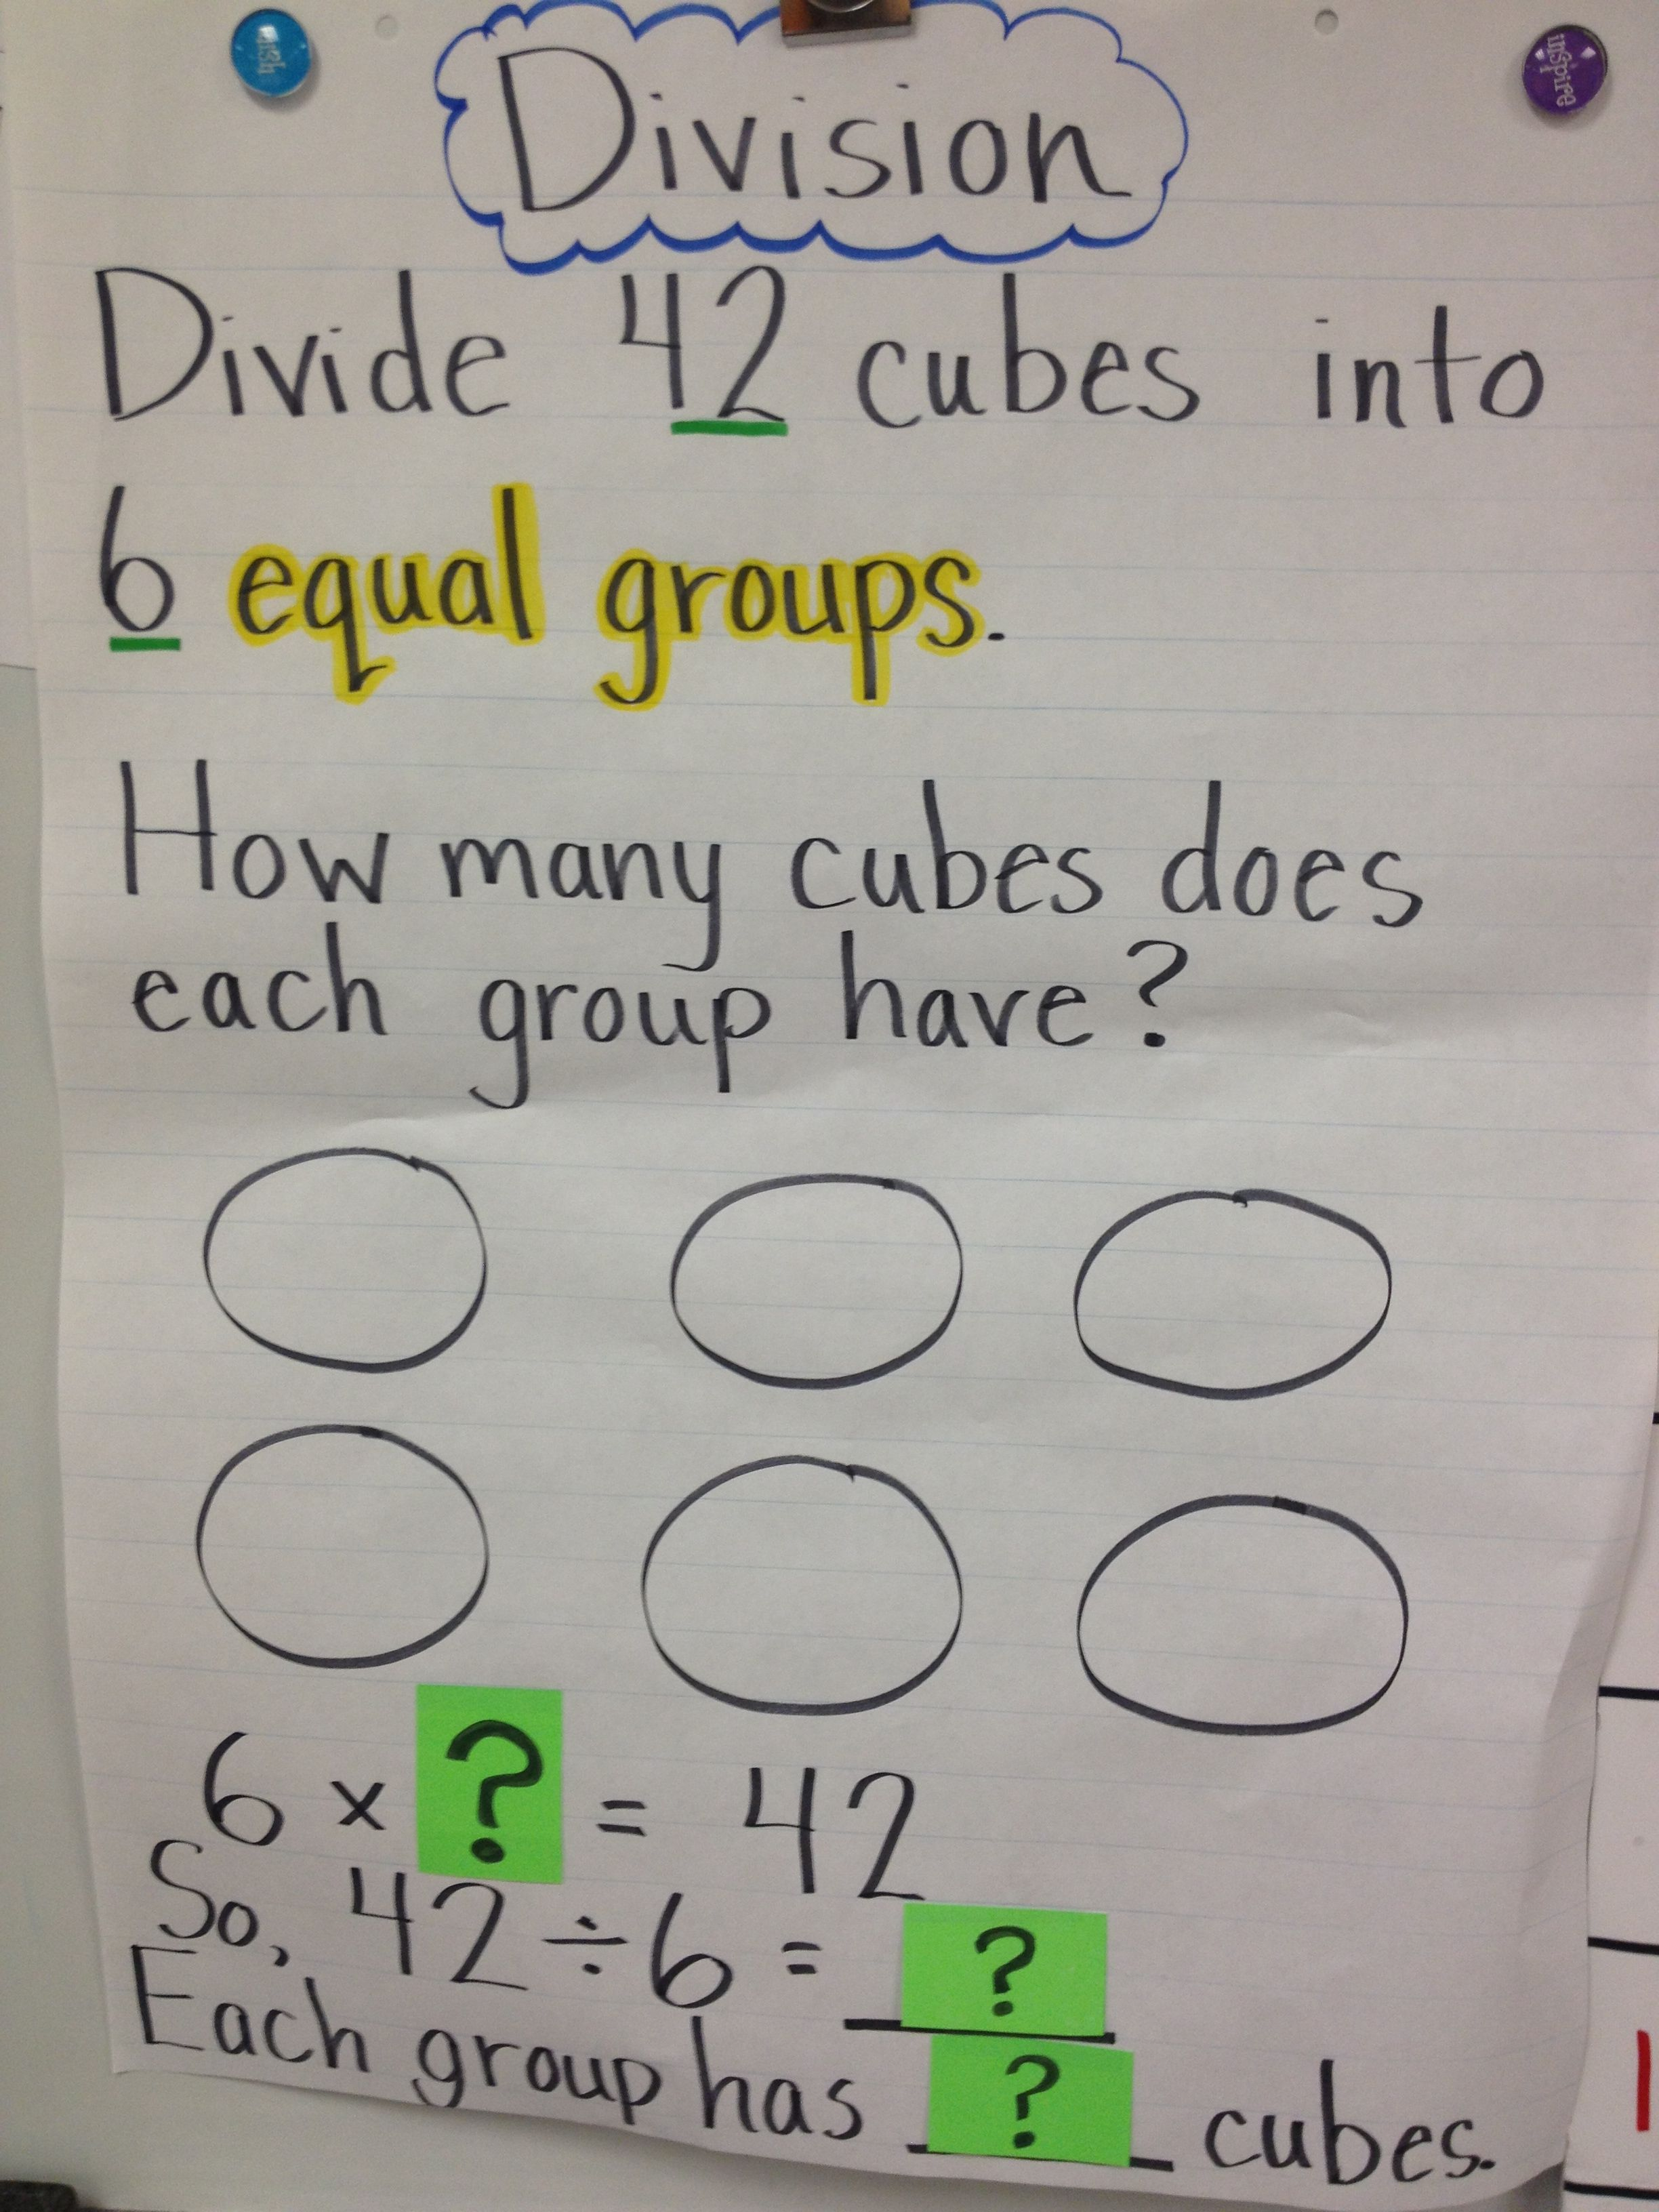 Division Making Equal Groups Grammar Worksheets 6th Grade Spelling Words Math Lessons Make equal groups year worksheet